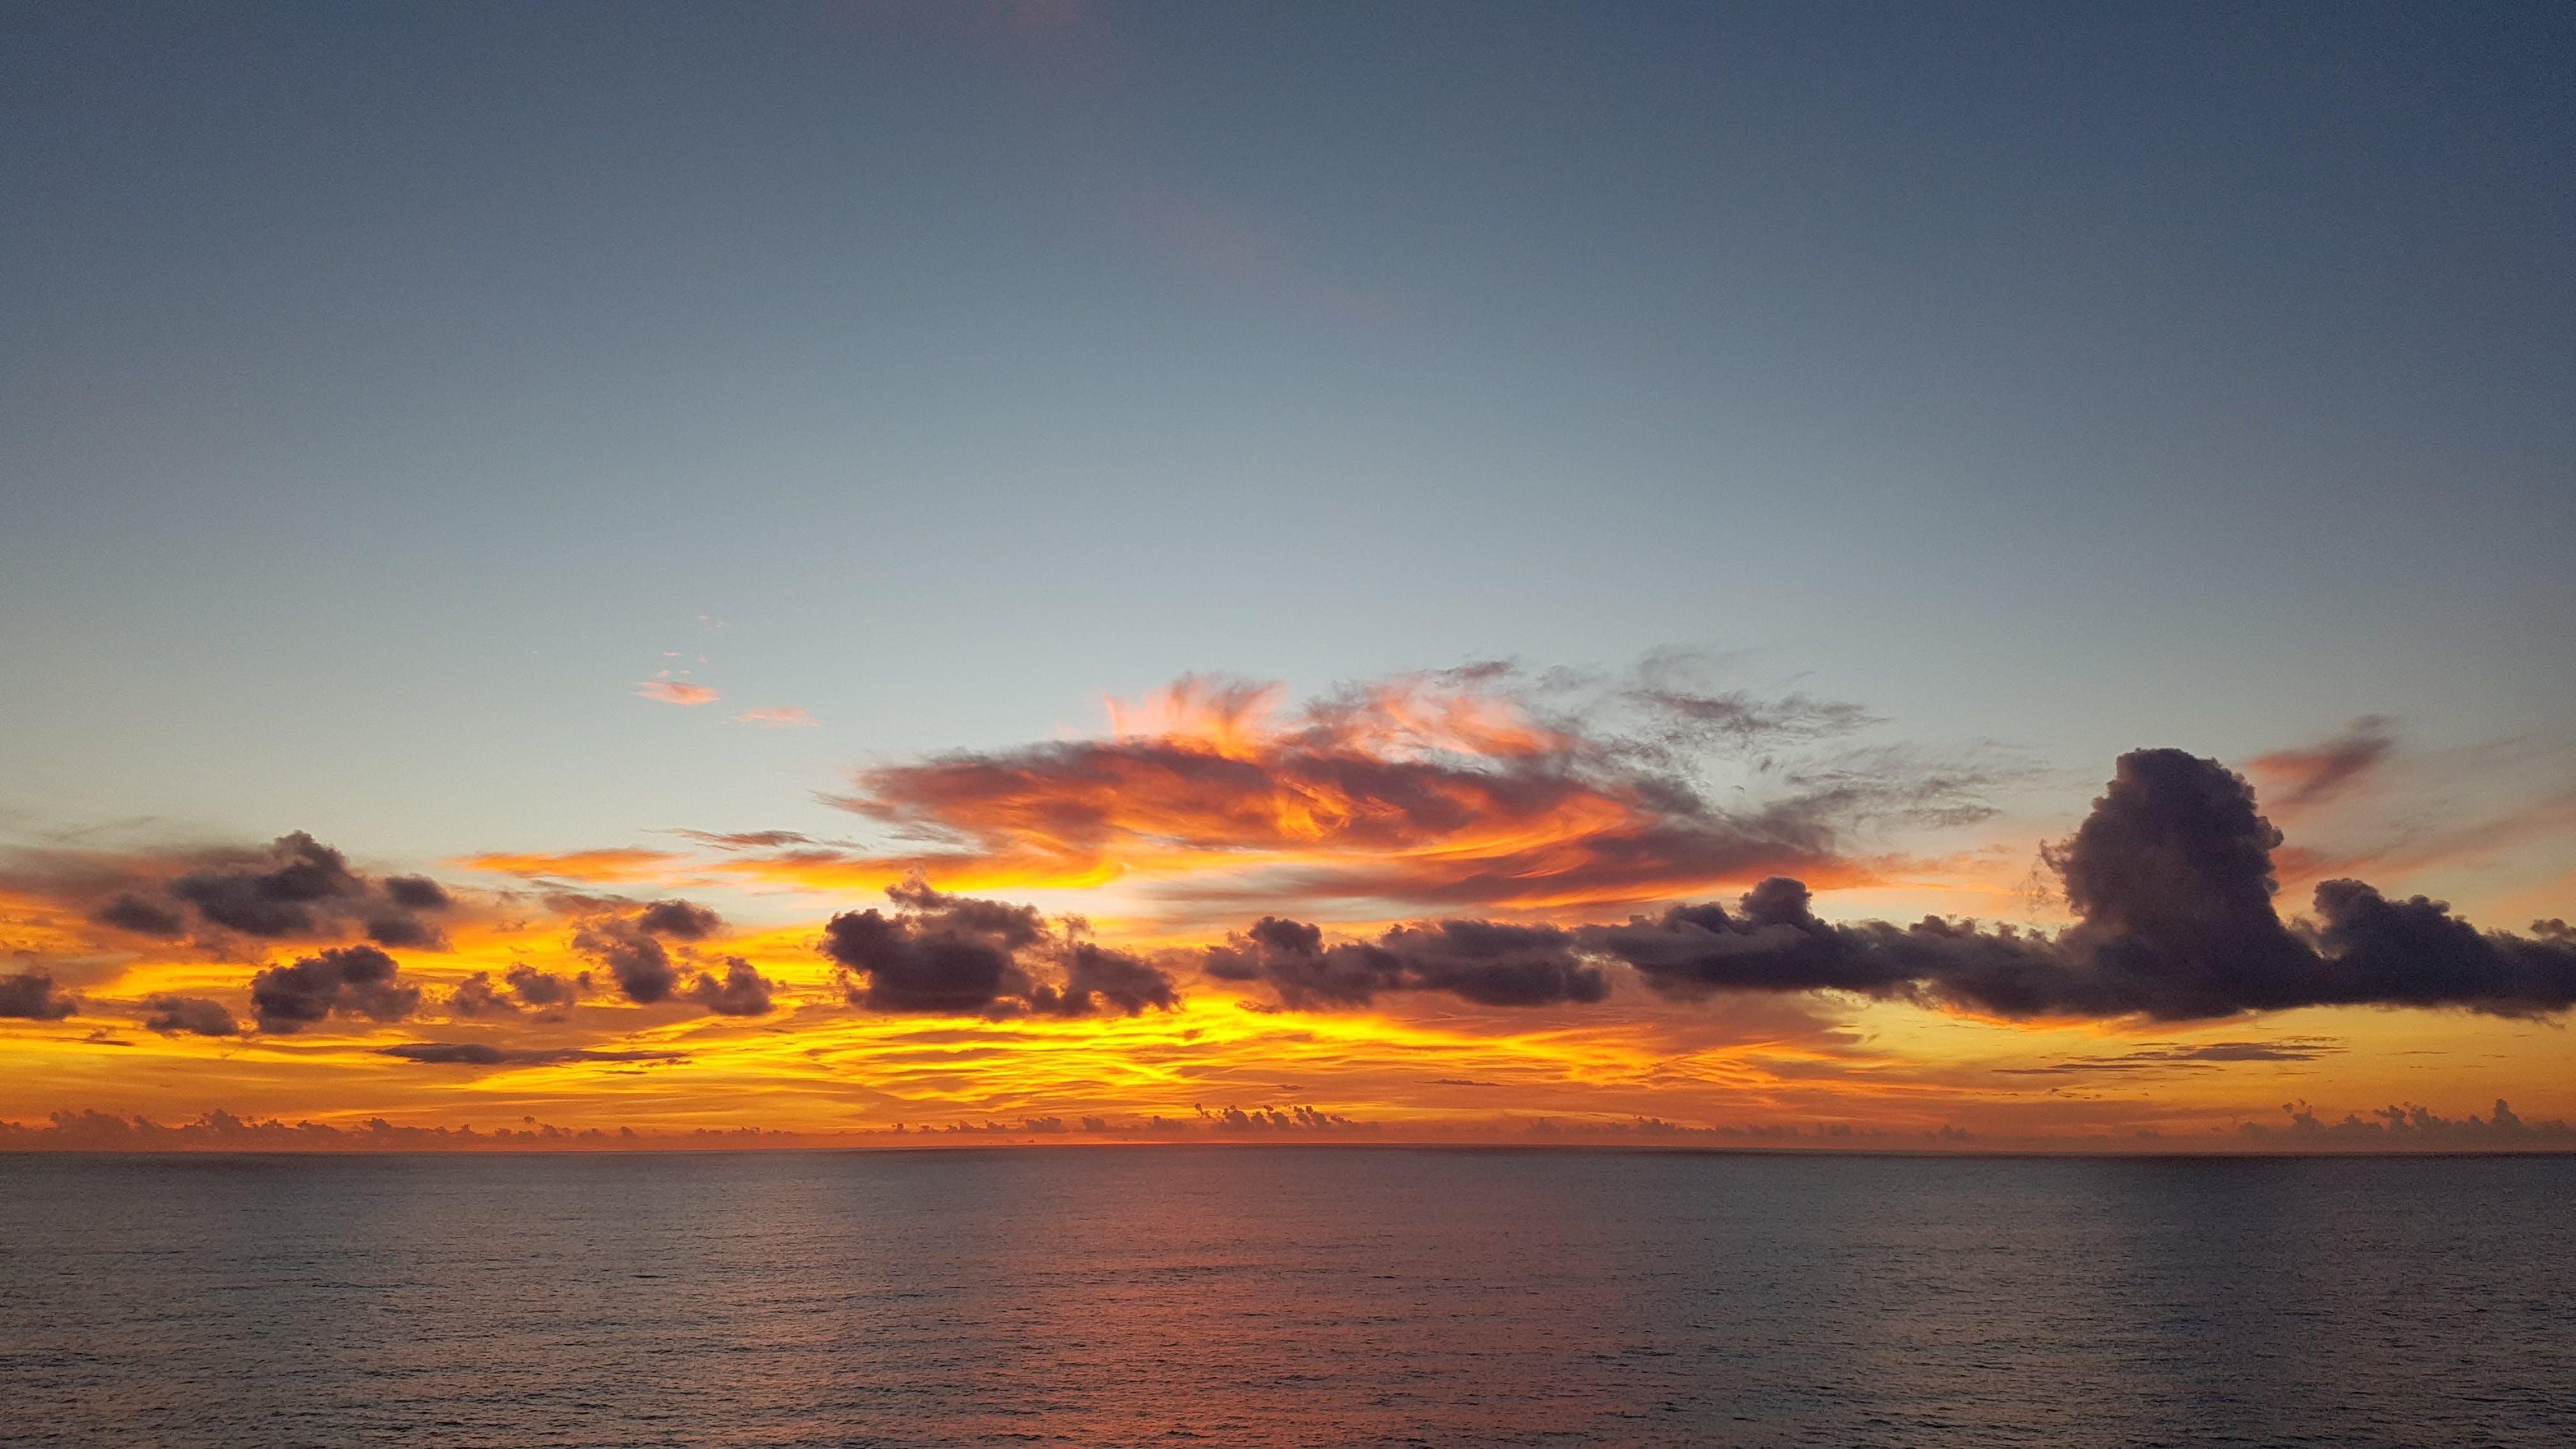 Landscape Photography of Sea Under Sunset